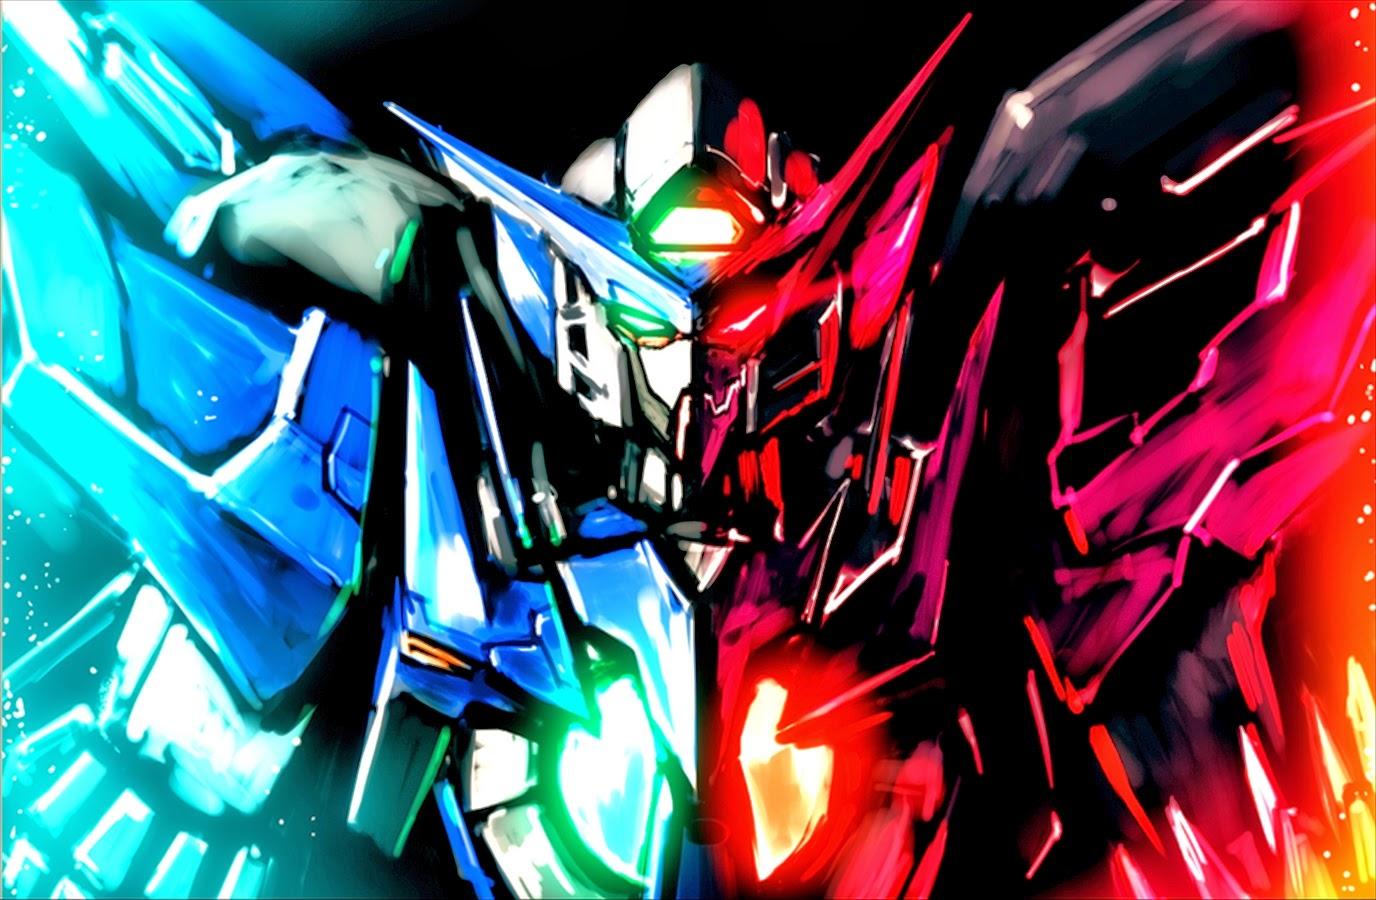 Gundam Exia Dark Matter Wallpaper Poster Image   Fanmade   Gundam 1376x900